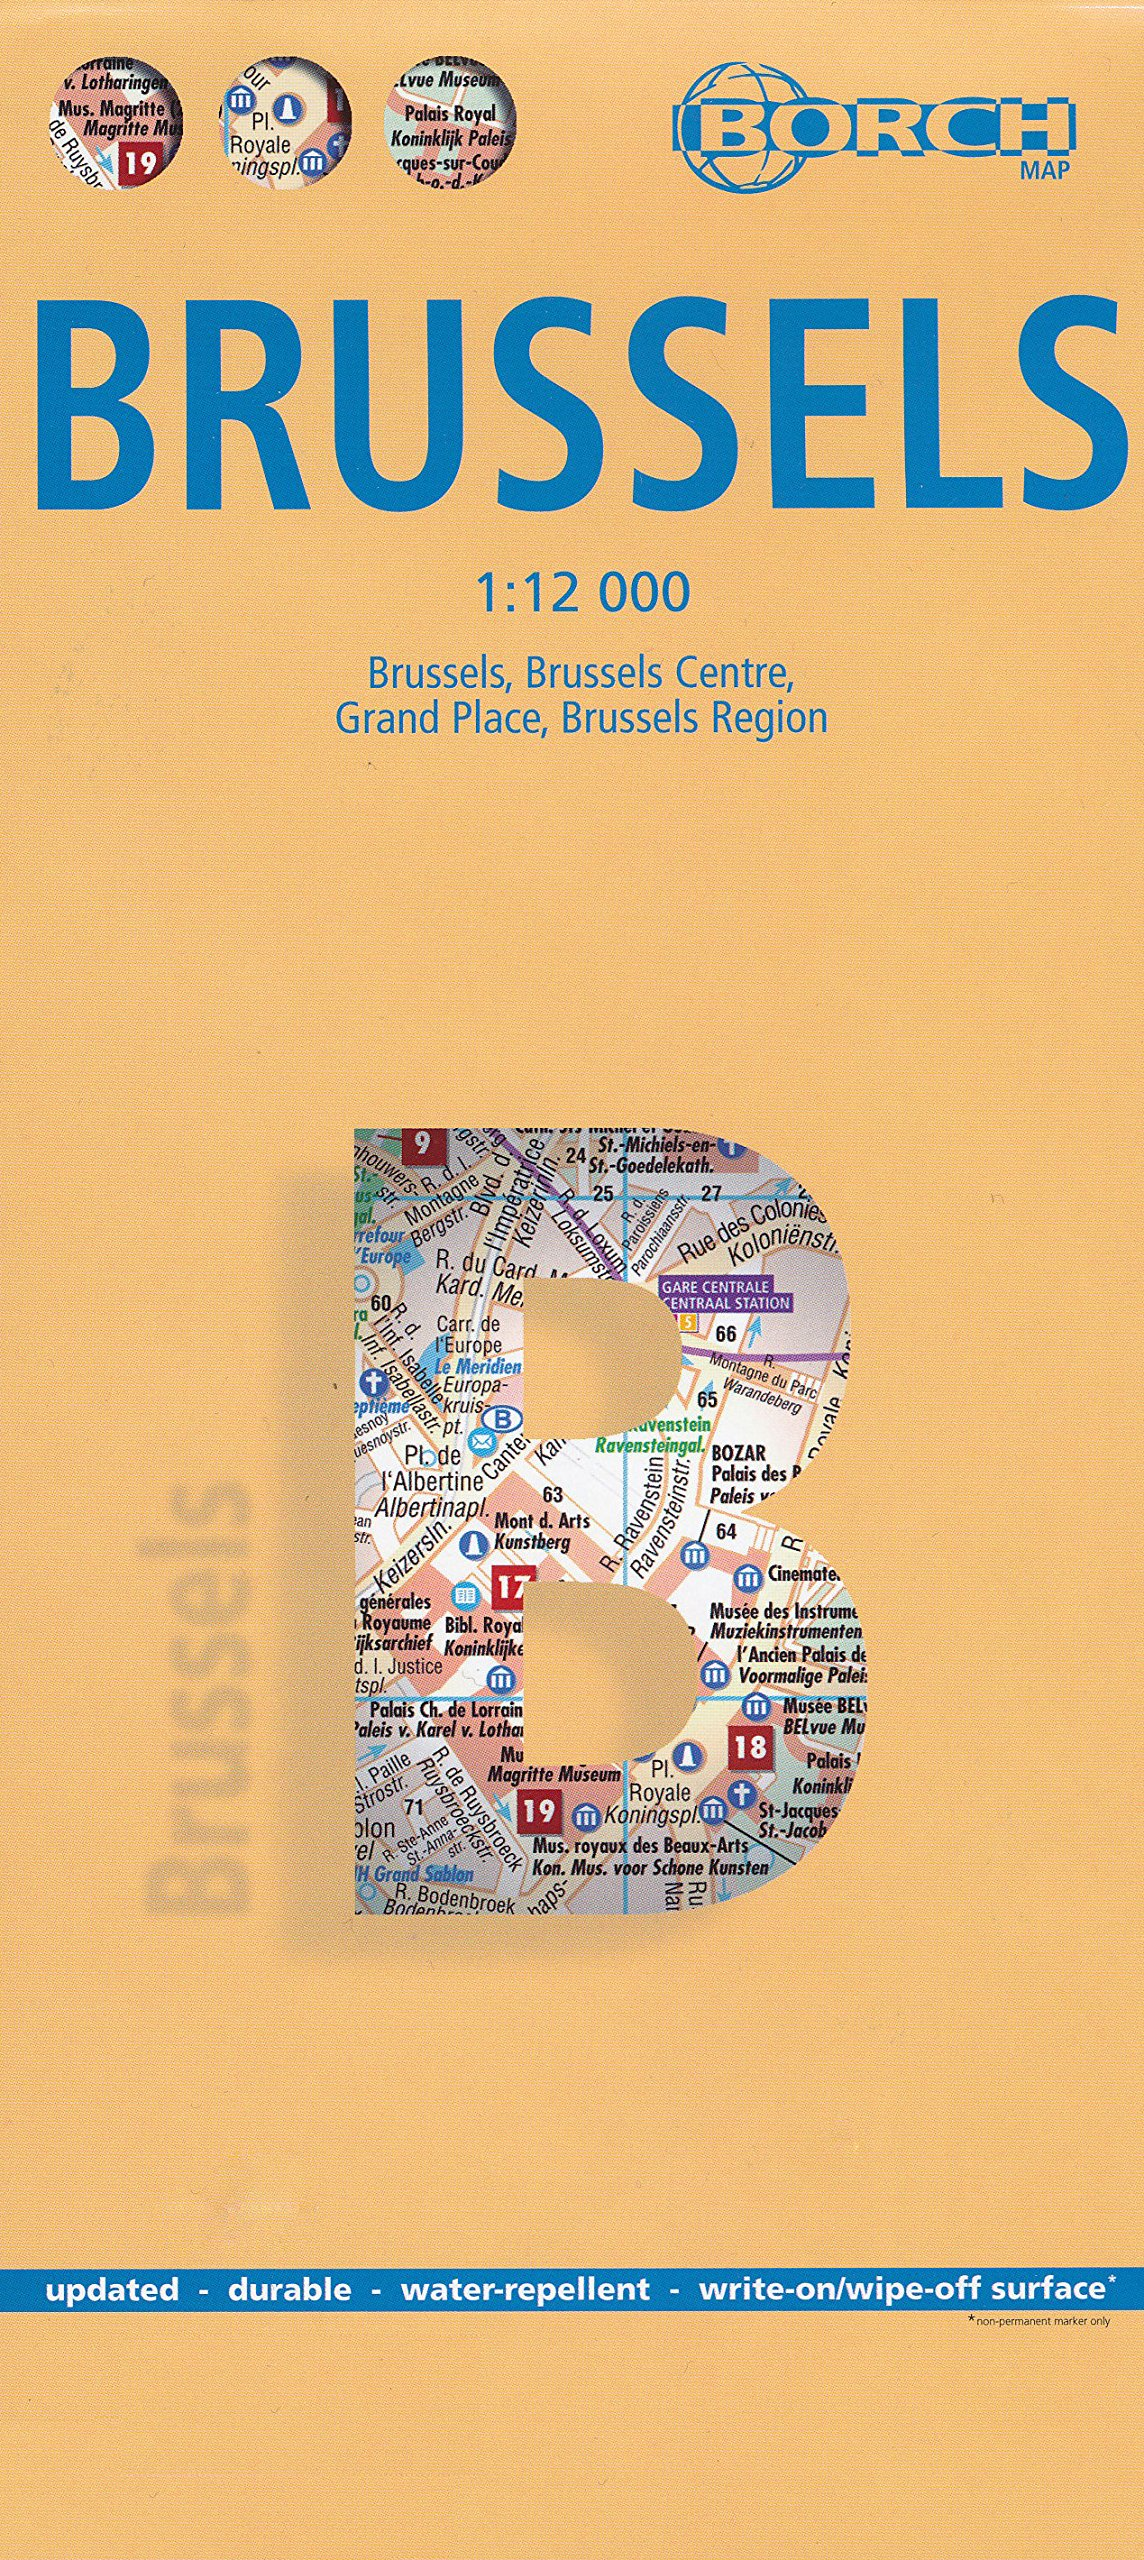 Brussels City Map: Borch: 9780702814242: Amazon.com: Books